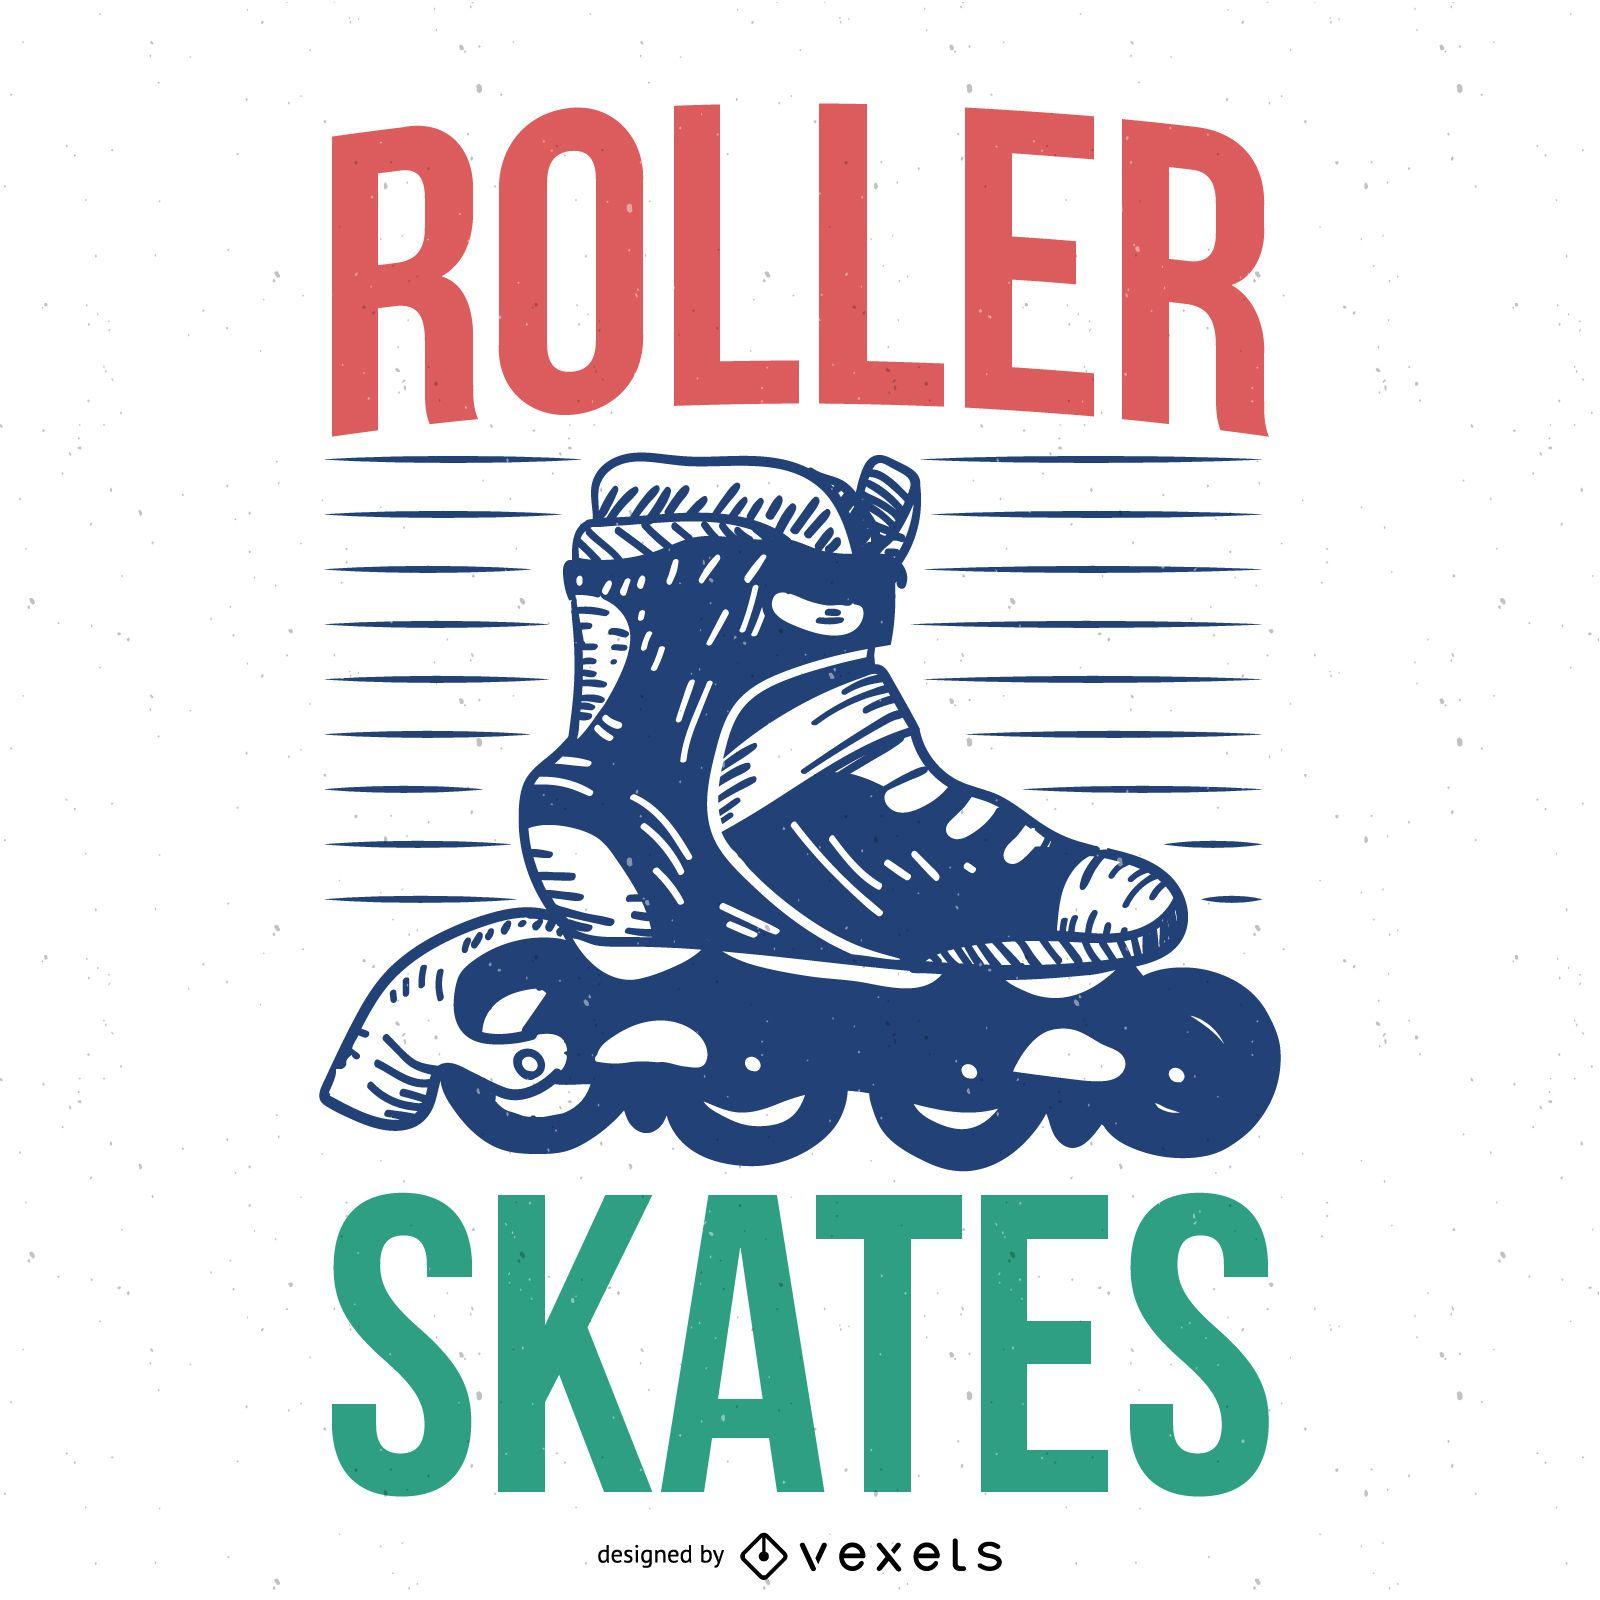 Roller skates poster design